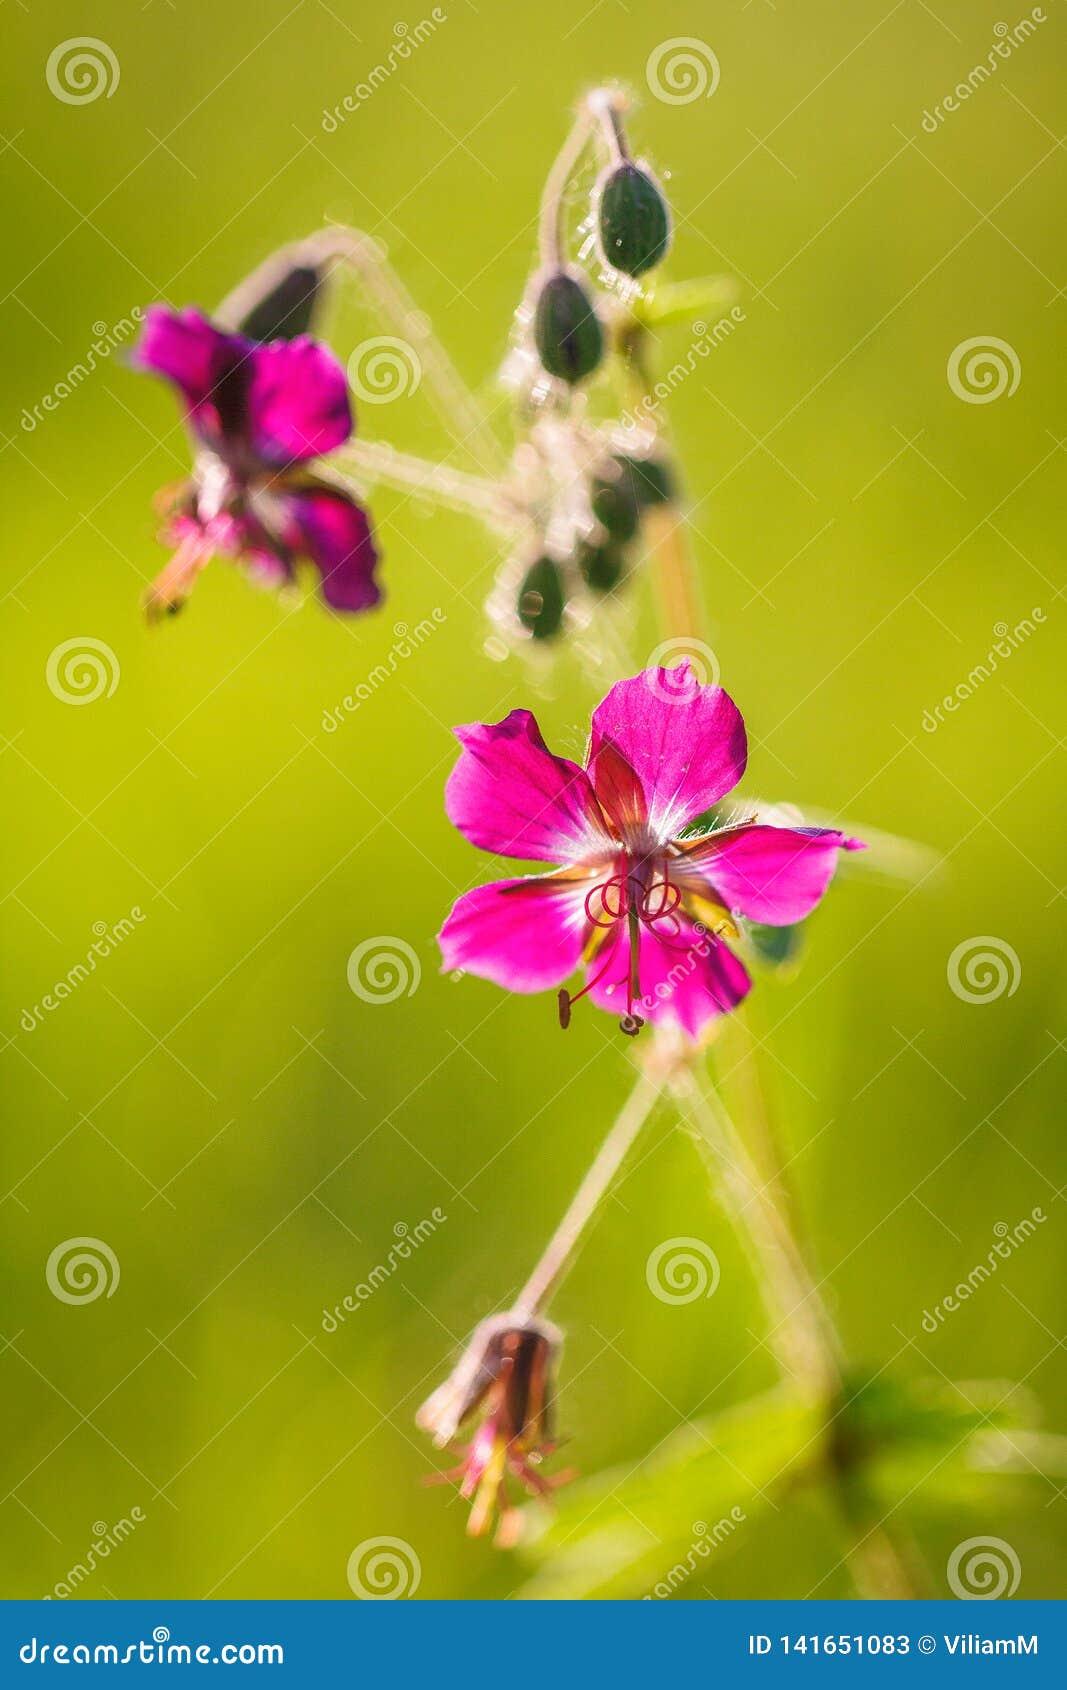 Dianthus carthusianorum, Carthusian Pink flower in macro view